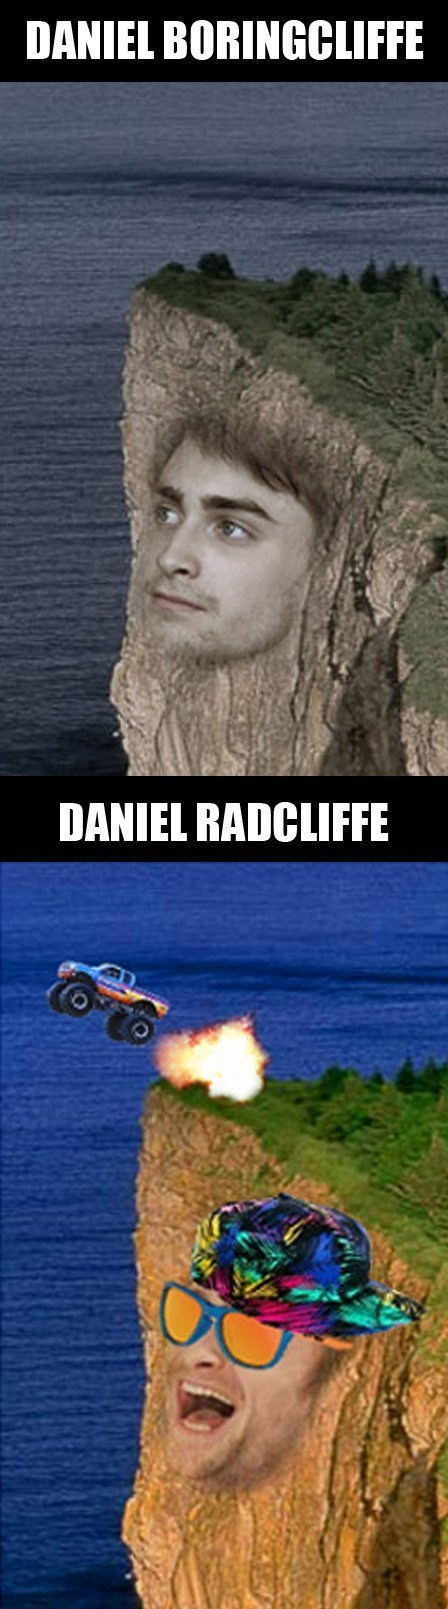 boring,Daniel Radcliffe